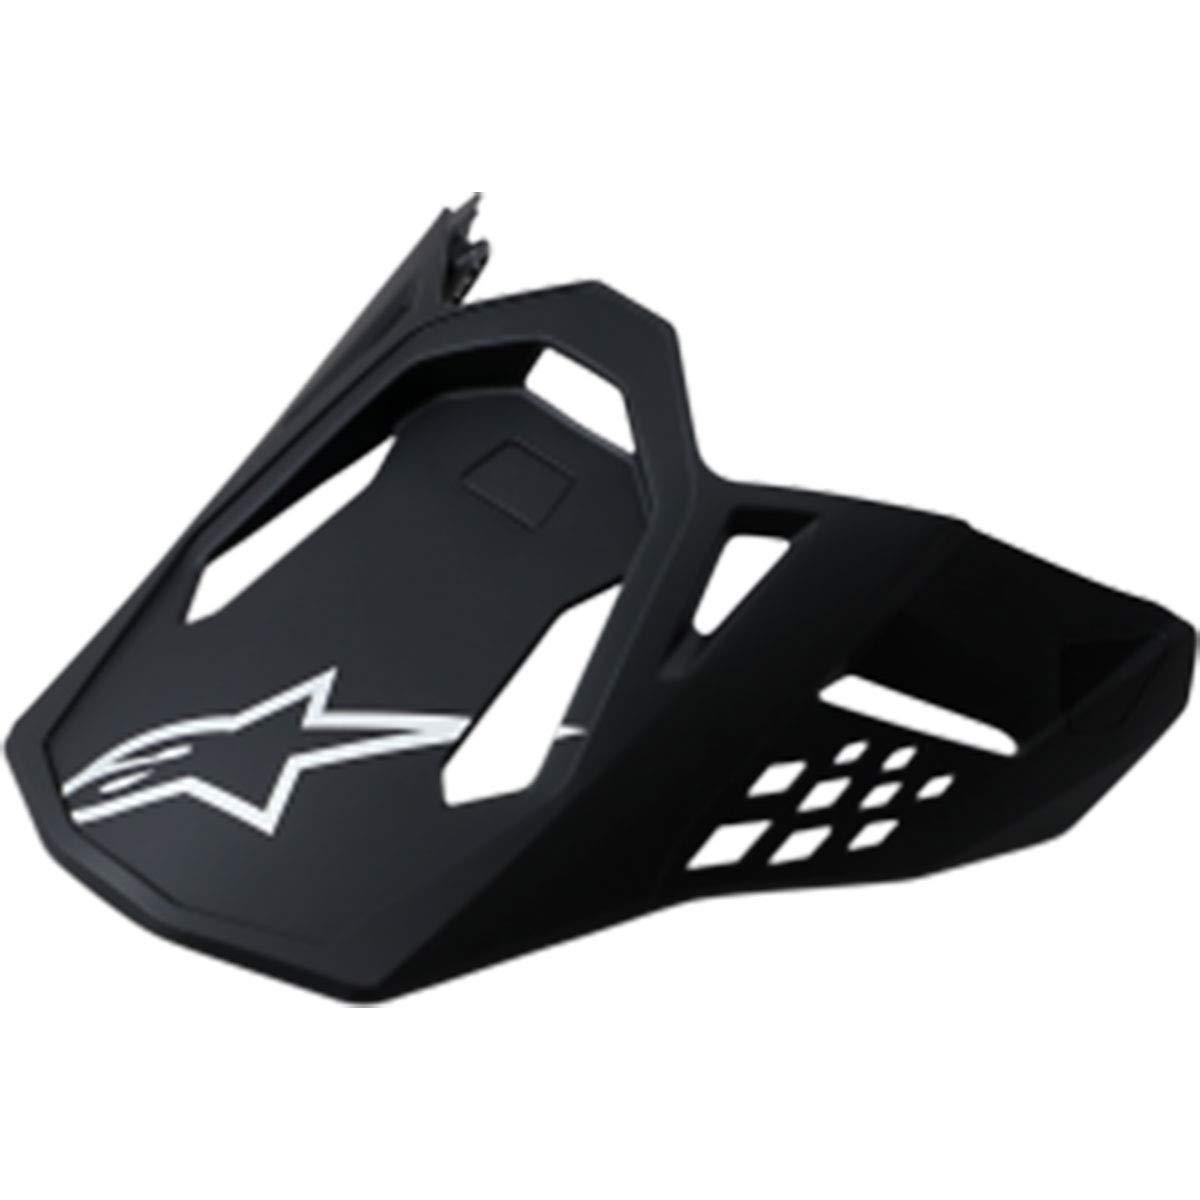 Alpinestars Supertech M-10/M-8 Visor Off-Road Motorcycle Helmet Accessories - Matte Black/One Size